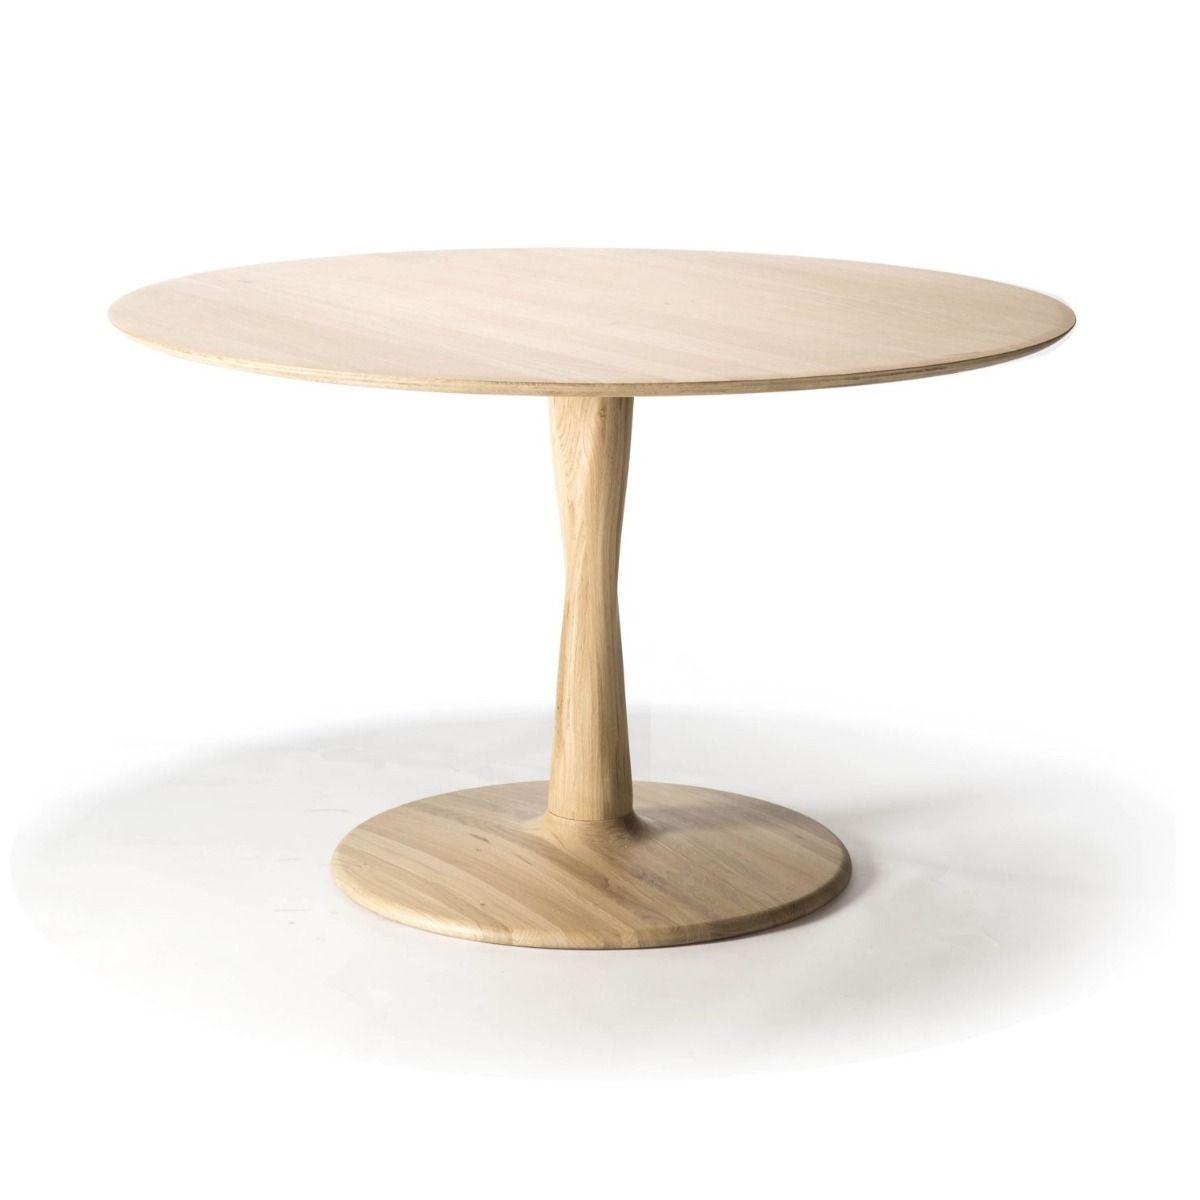 Ethnicraft Torsion Table in Oak